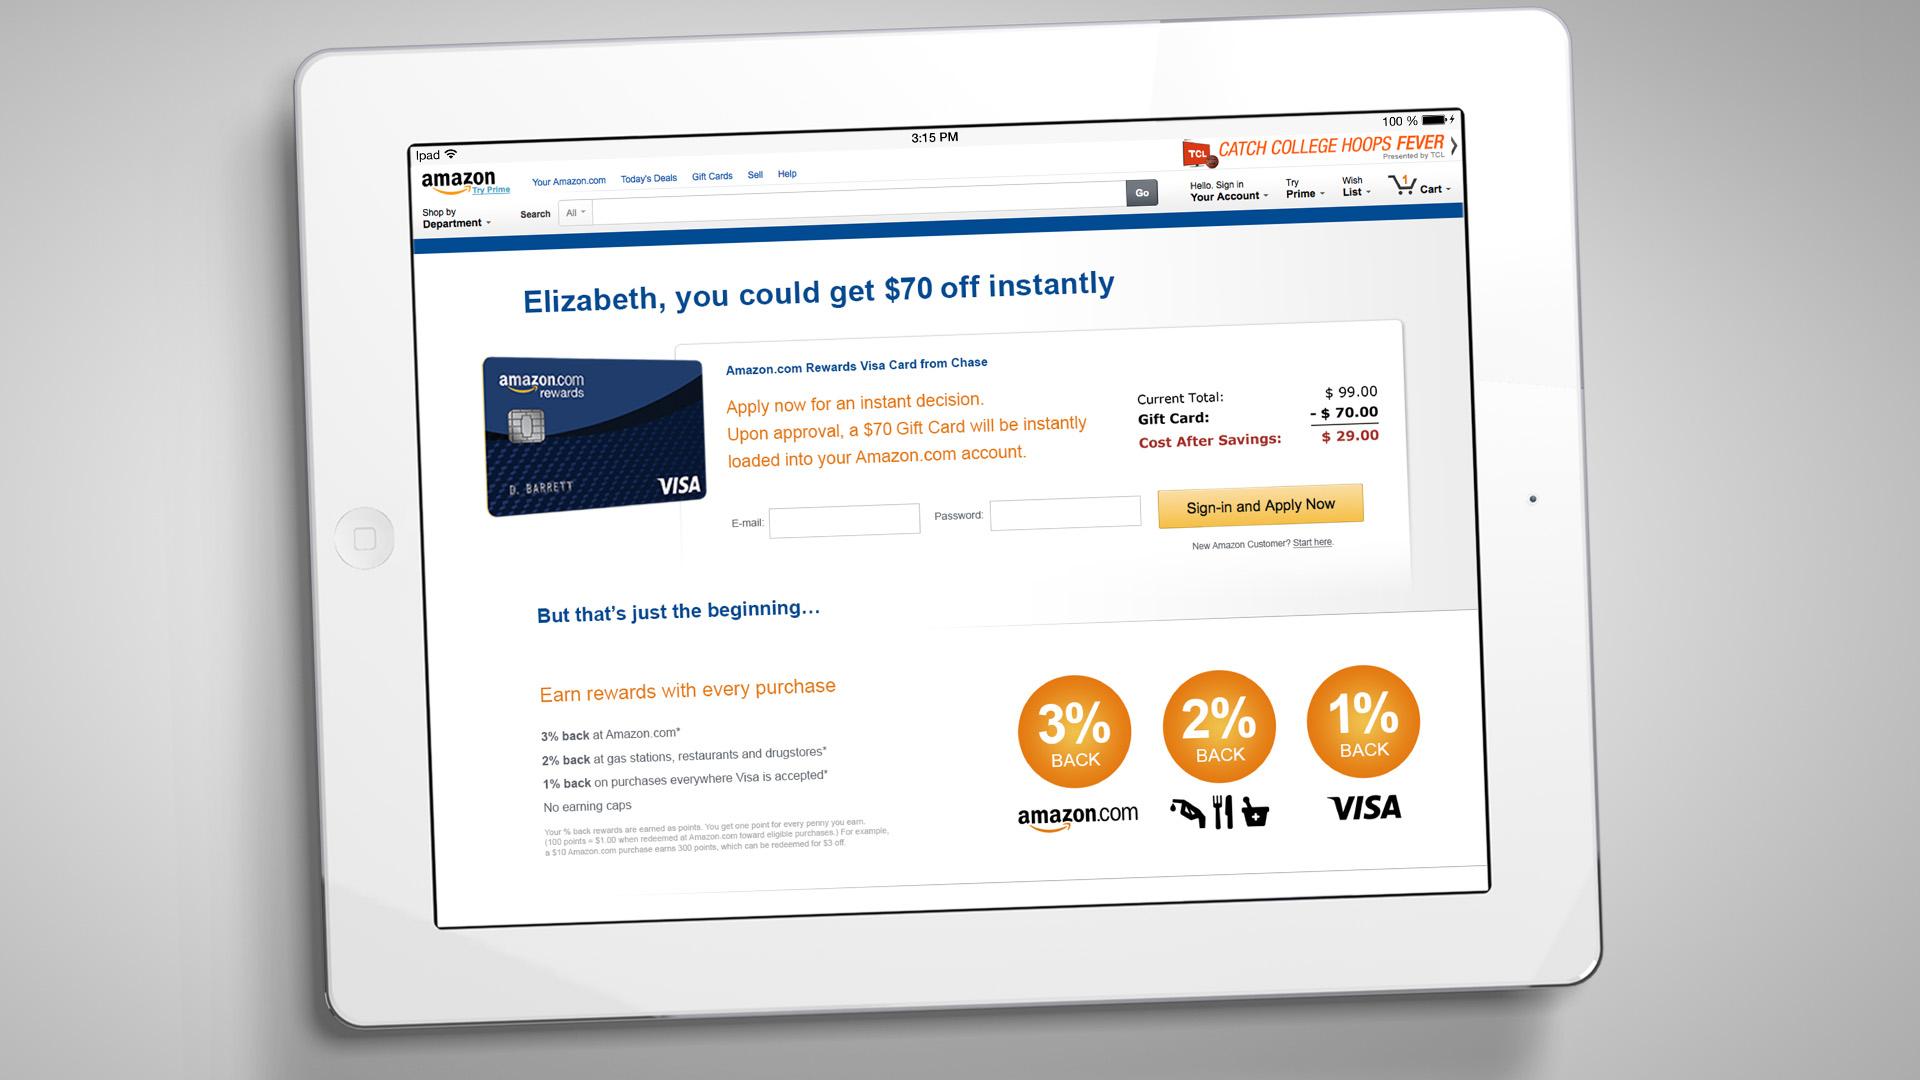 29051_Amazon-Visa-MarketingPage_16x9-E.jpg